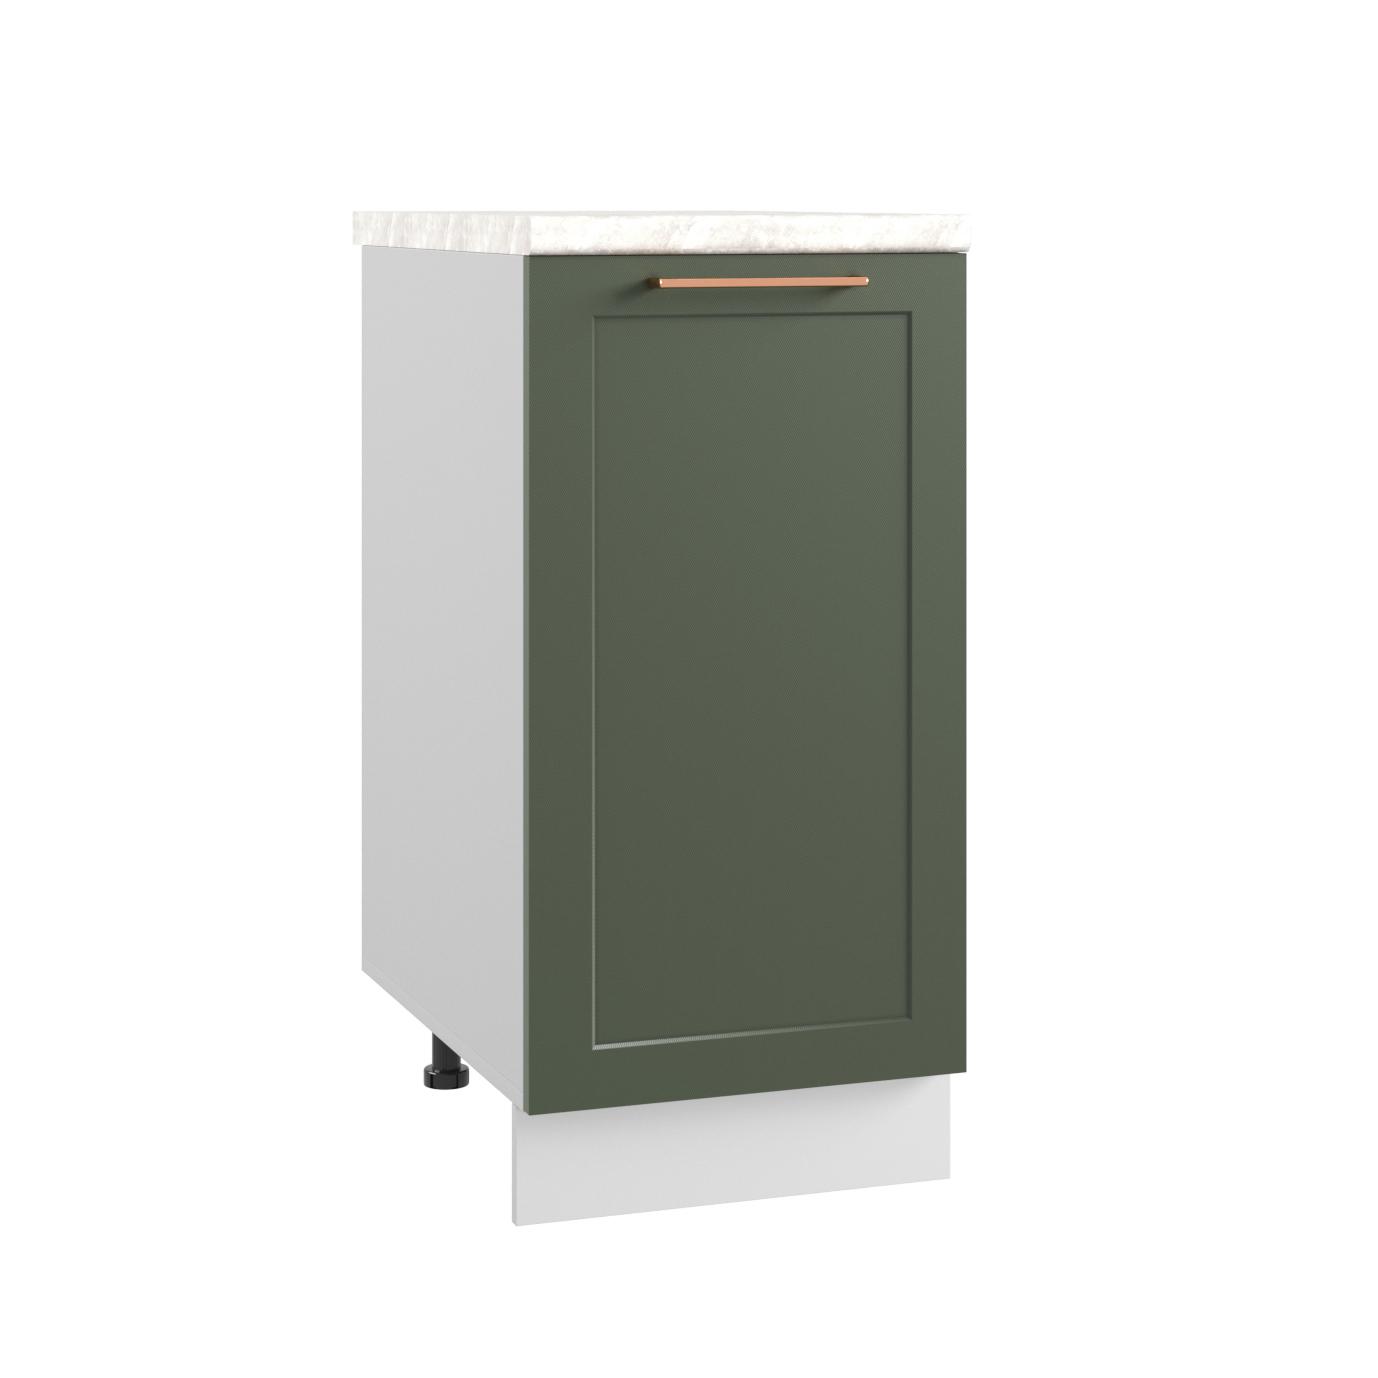 Кухня Квадро С 400 Шкаф нижний